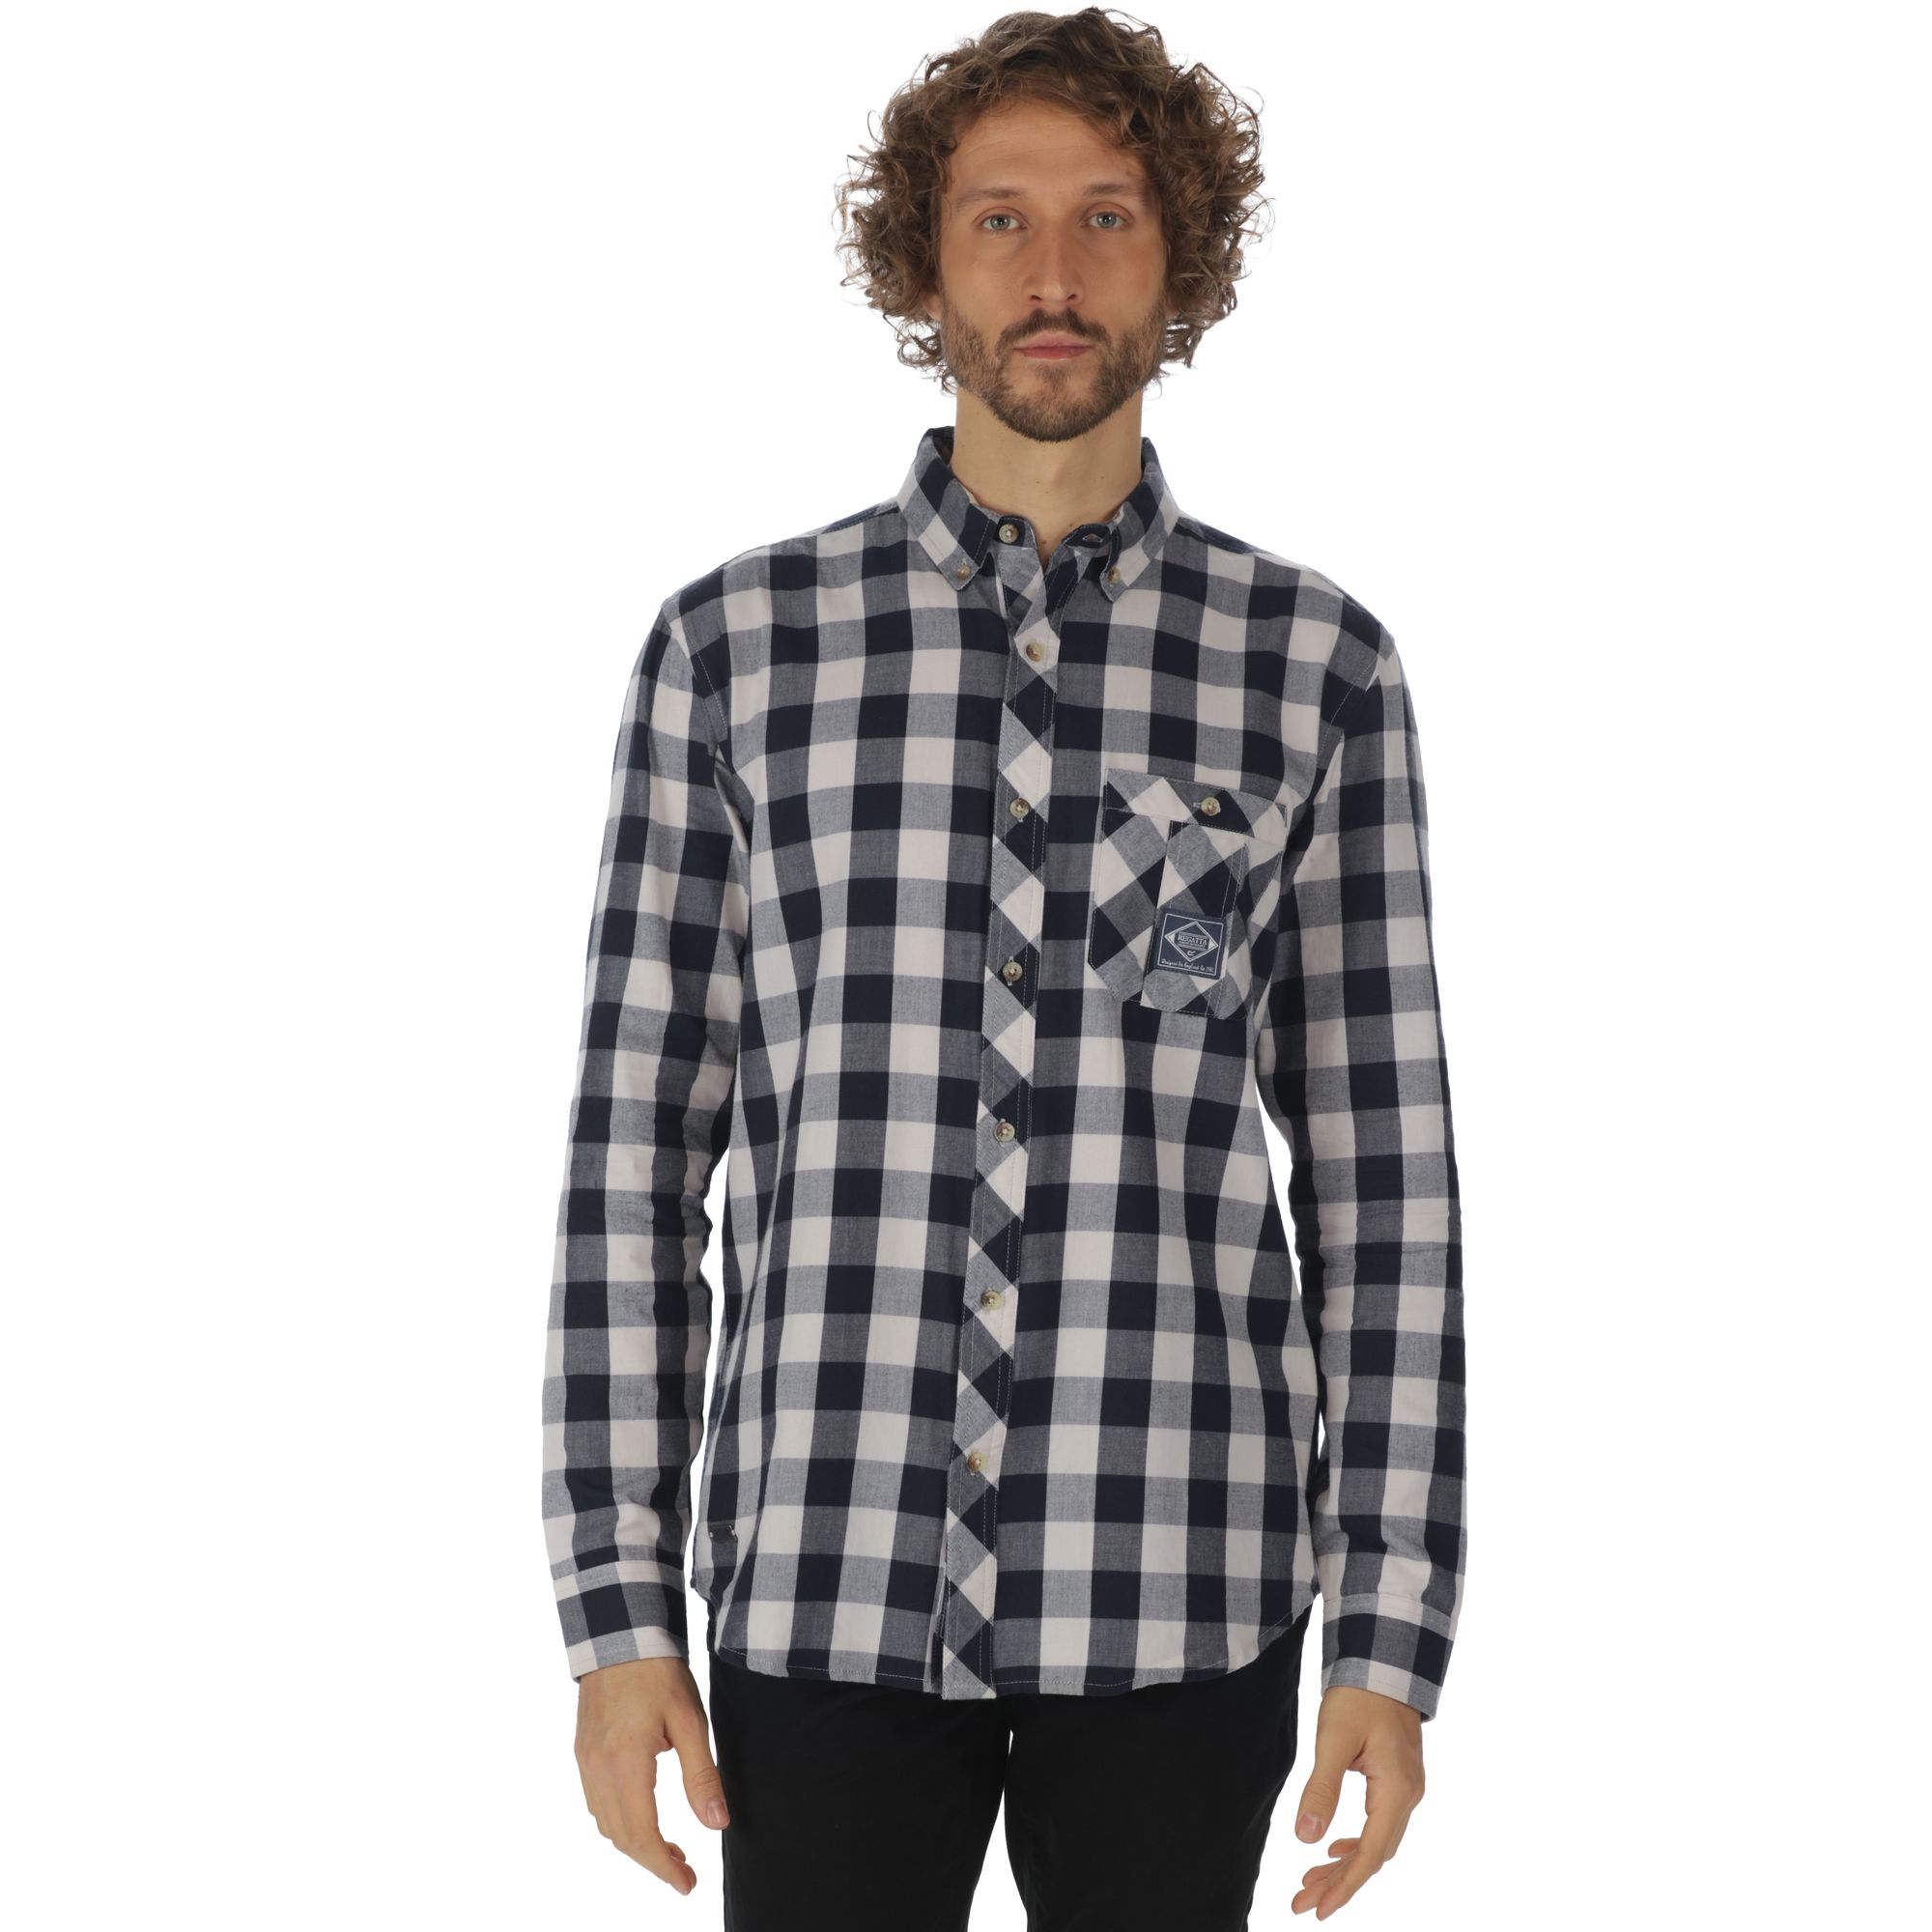 Regatta-Camisa-de-manga-larga-modelo-Loman-para-hombre-RG2858